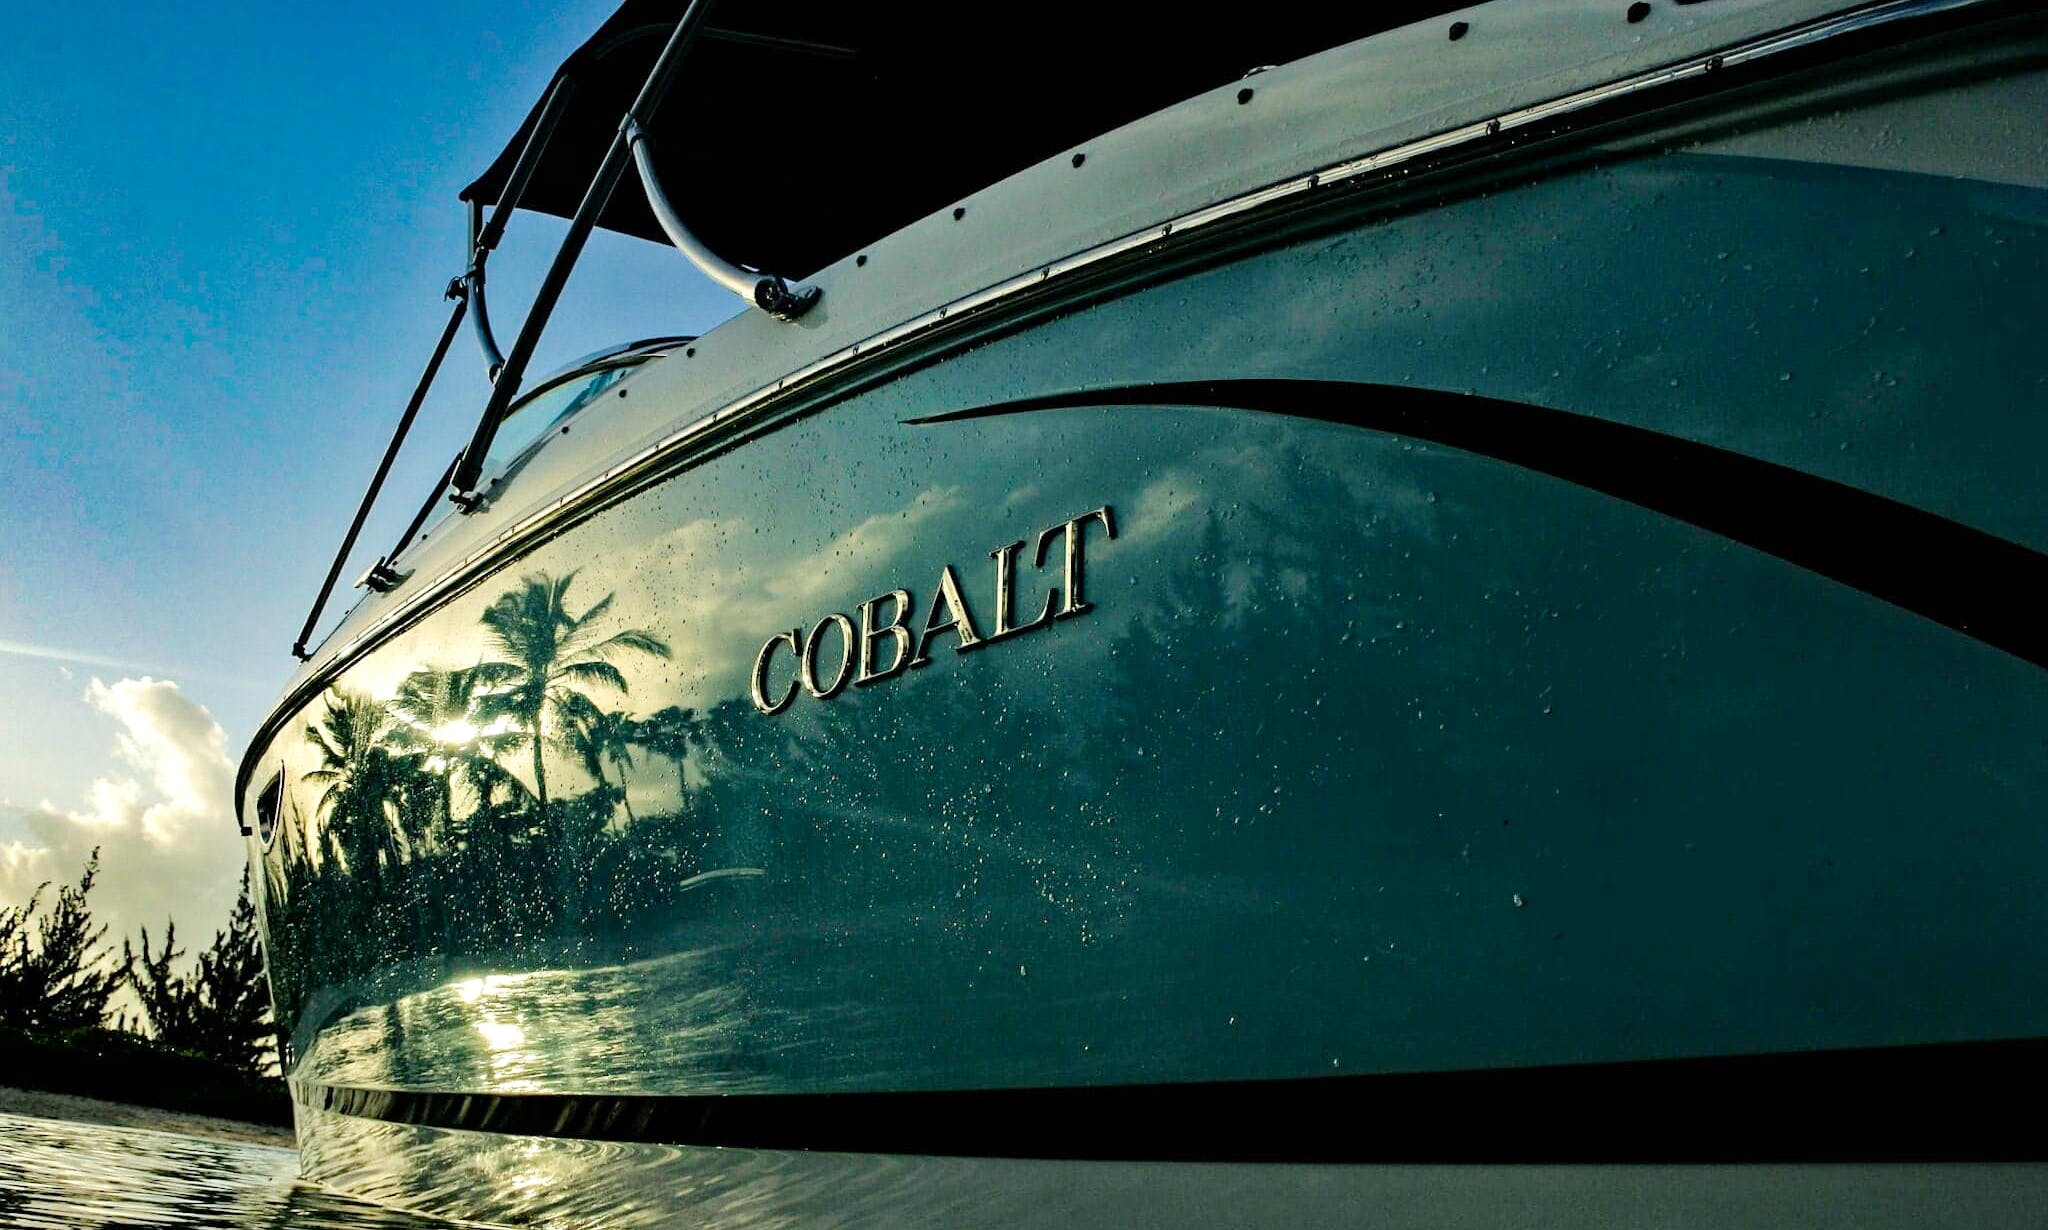 Cobalt R5 Bowrider Boat Rental In George Town, Cayman Islands